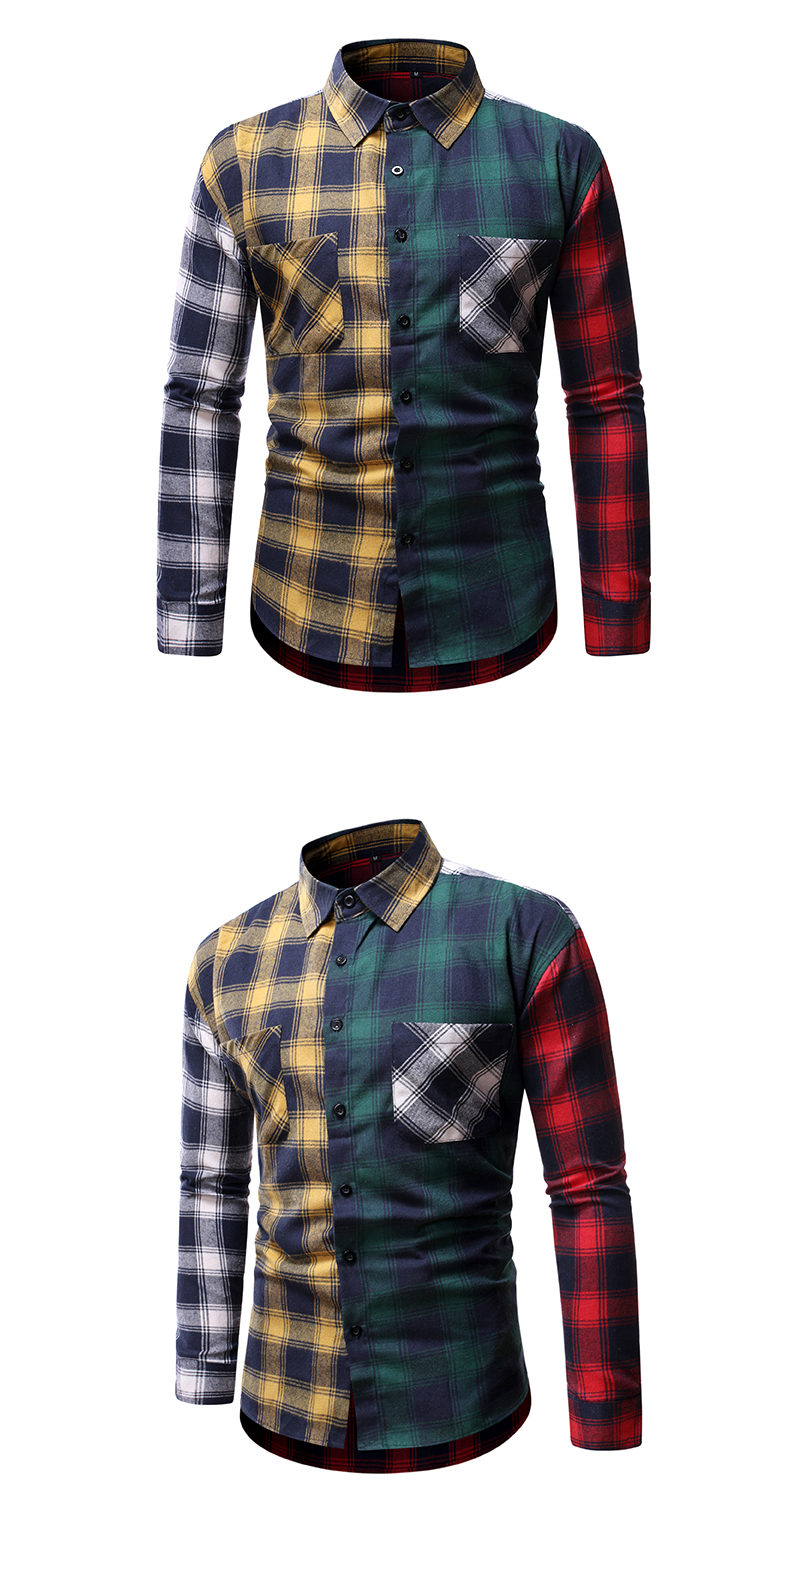 camisa da xadrez da primavera do outono